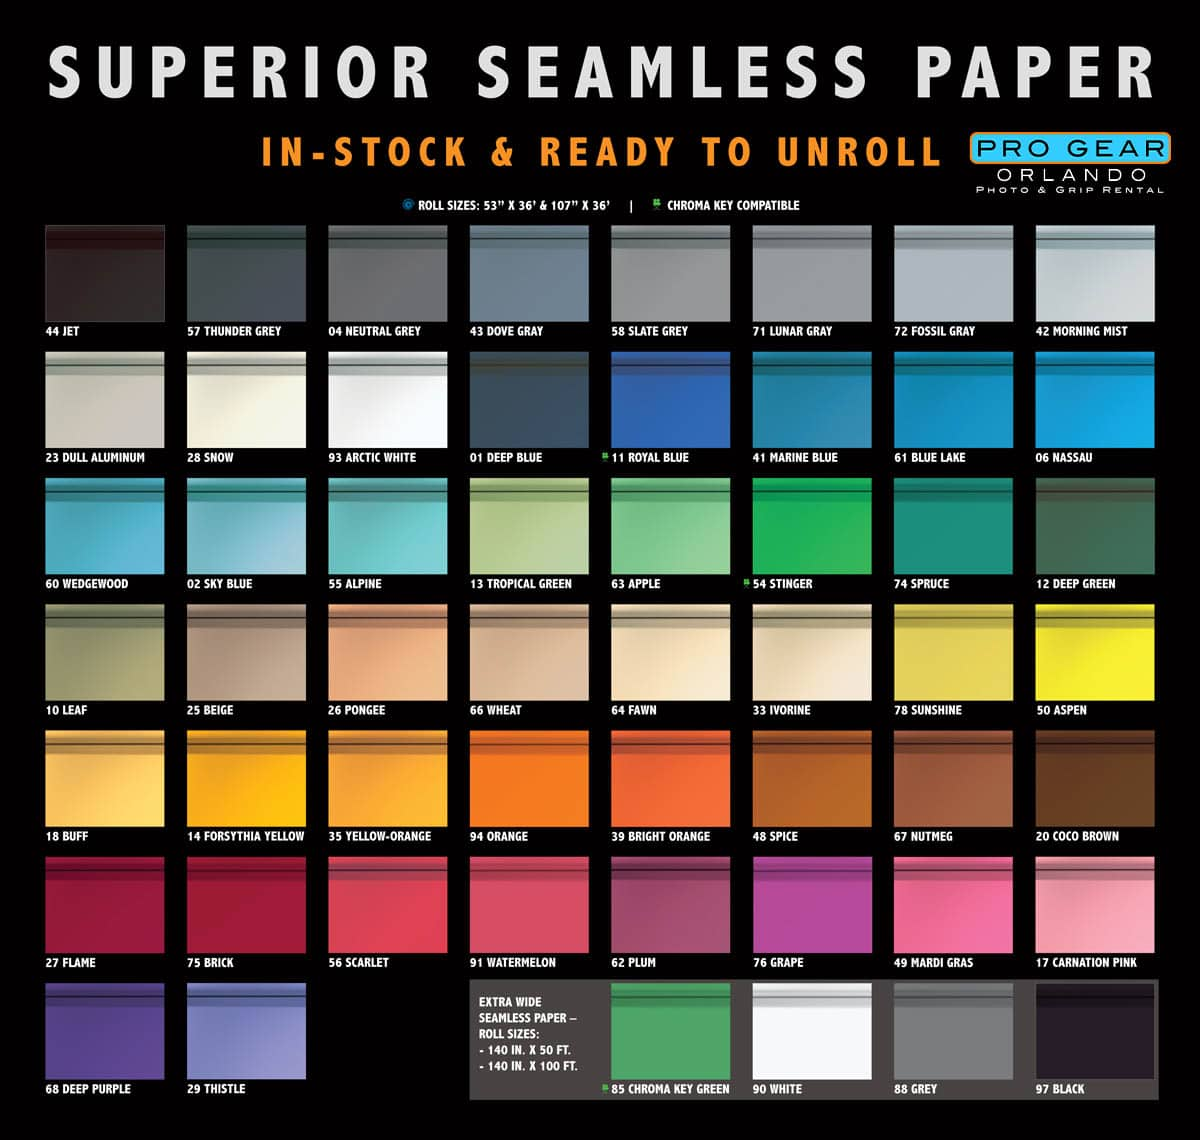 Superior Seamless Poster